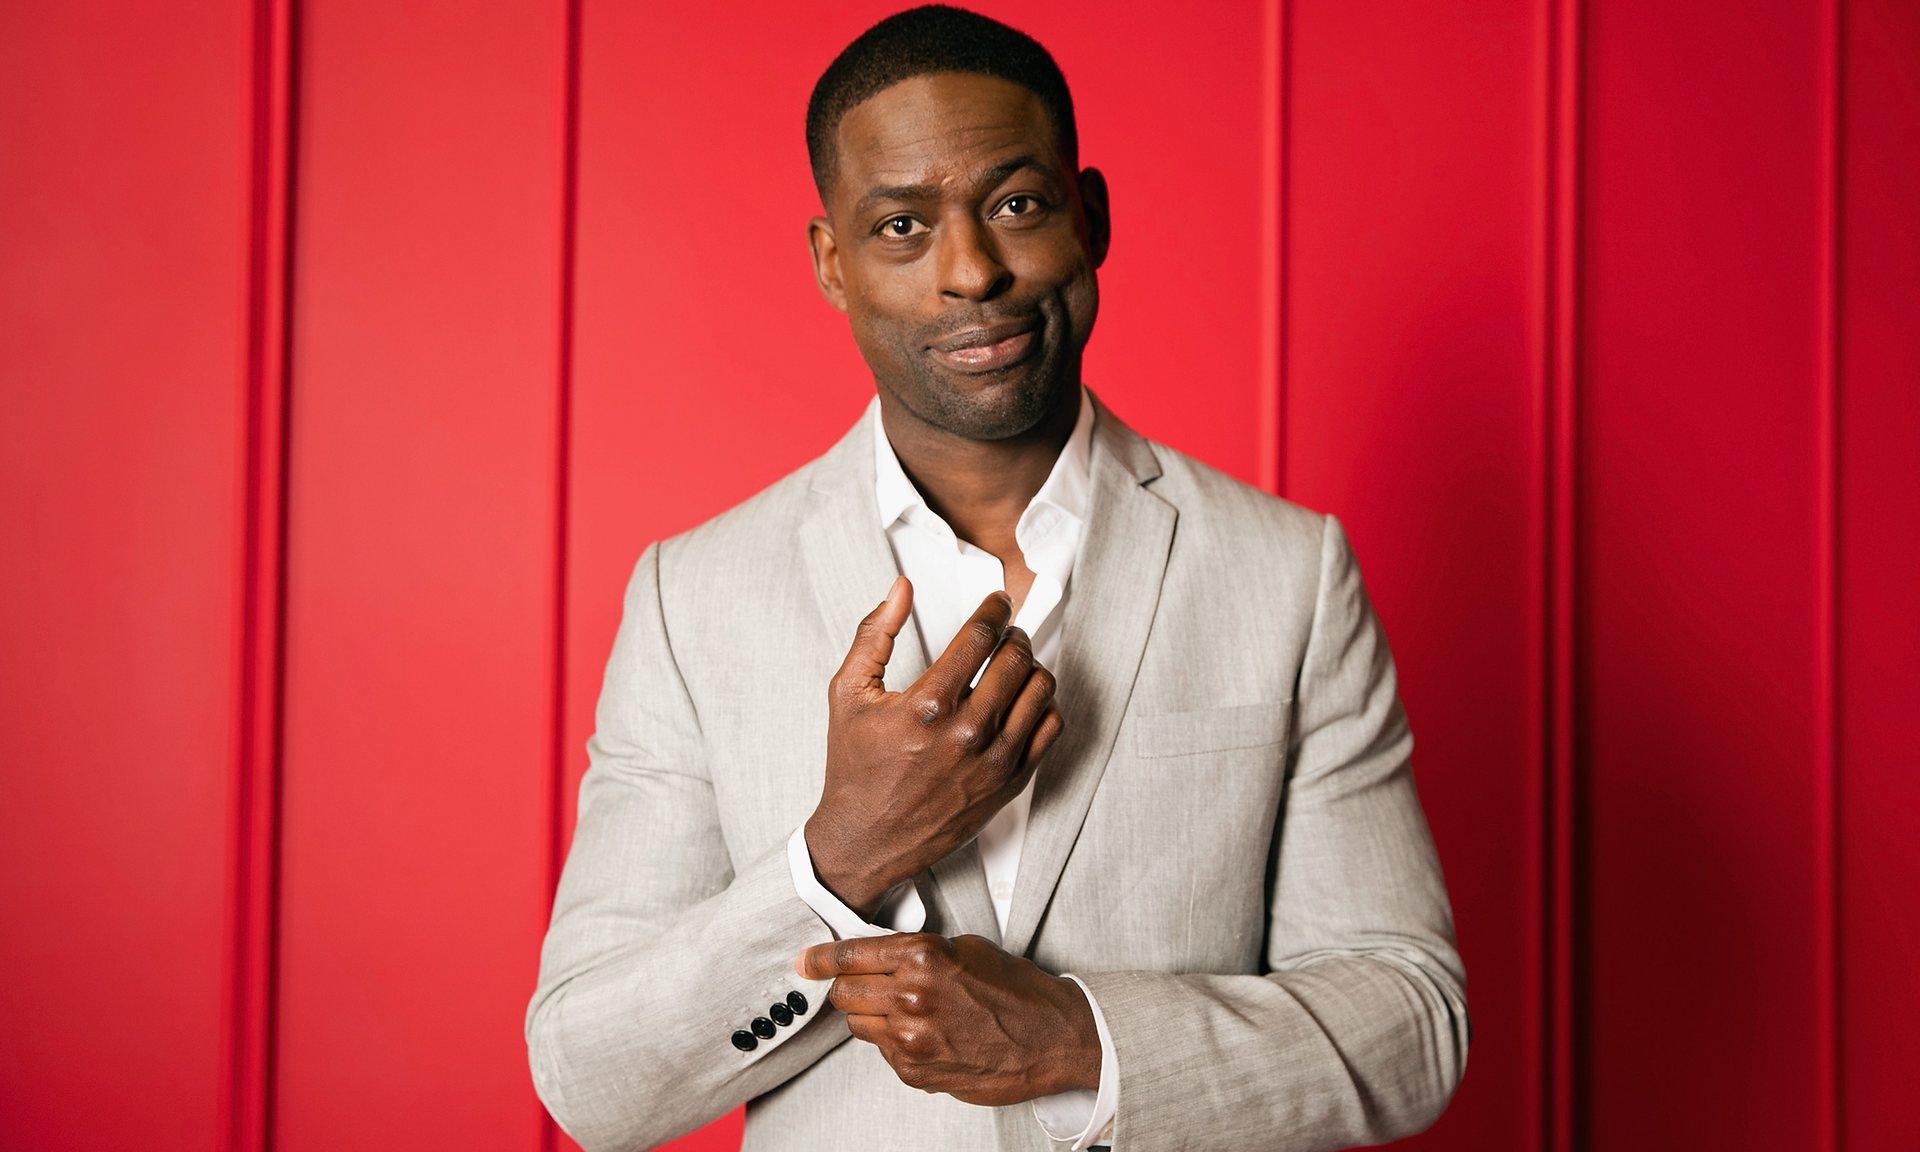 Sterling K. Brown, This Is Us, People v OJ, African American Entertainment, KOLUMN Magazine, KOLUMN